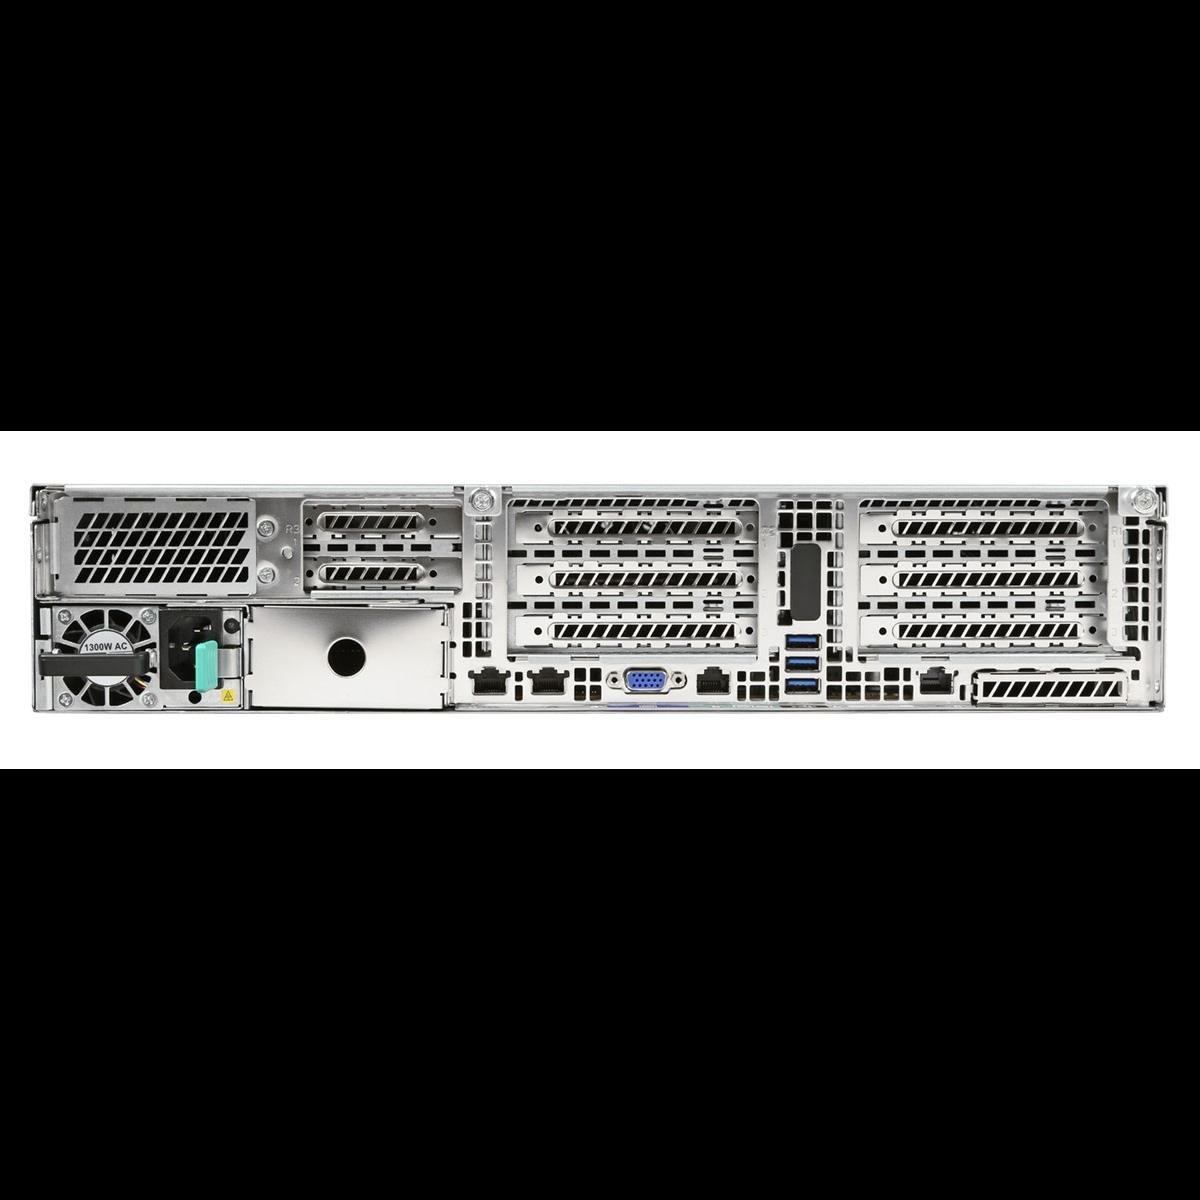 Серверная платформа Intel R2224WFTZSR 2U, до двух процессоров Intel Scalable, 24xDDR4, 24x2.5 HDD, 2x10Gb Base-T, 2xM.2 PCI-Ex4, 2x1300W PSU